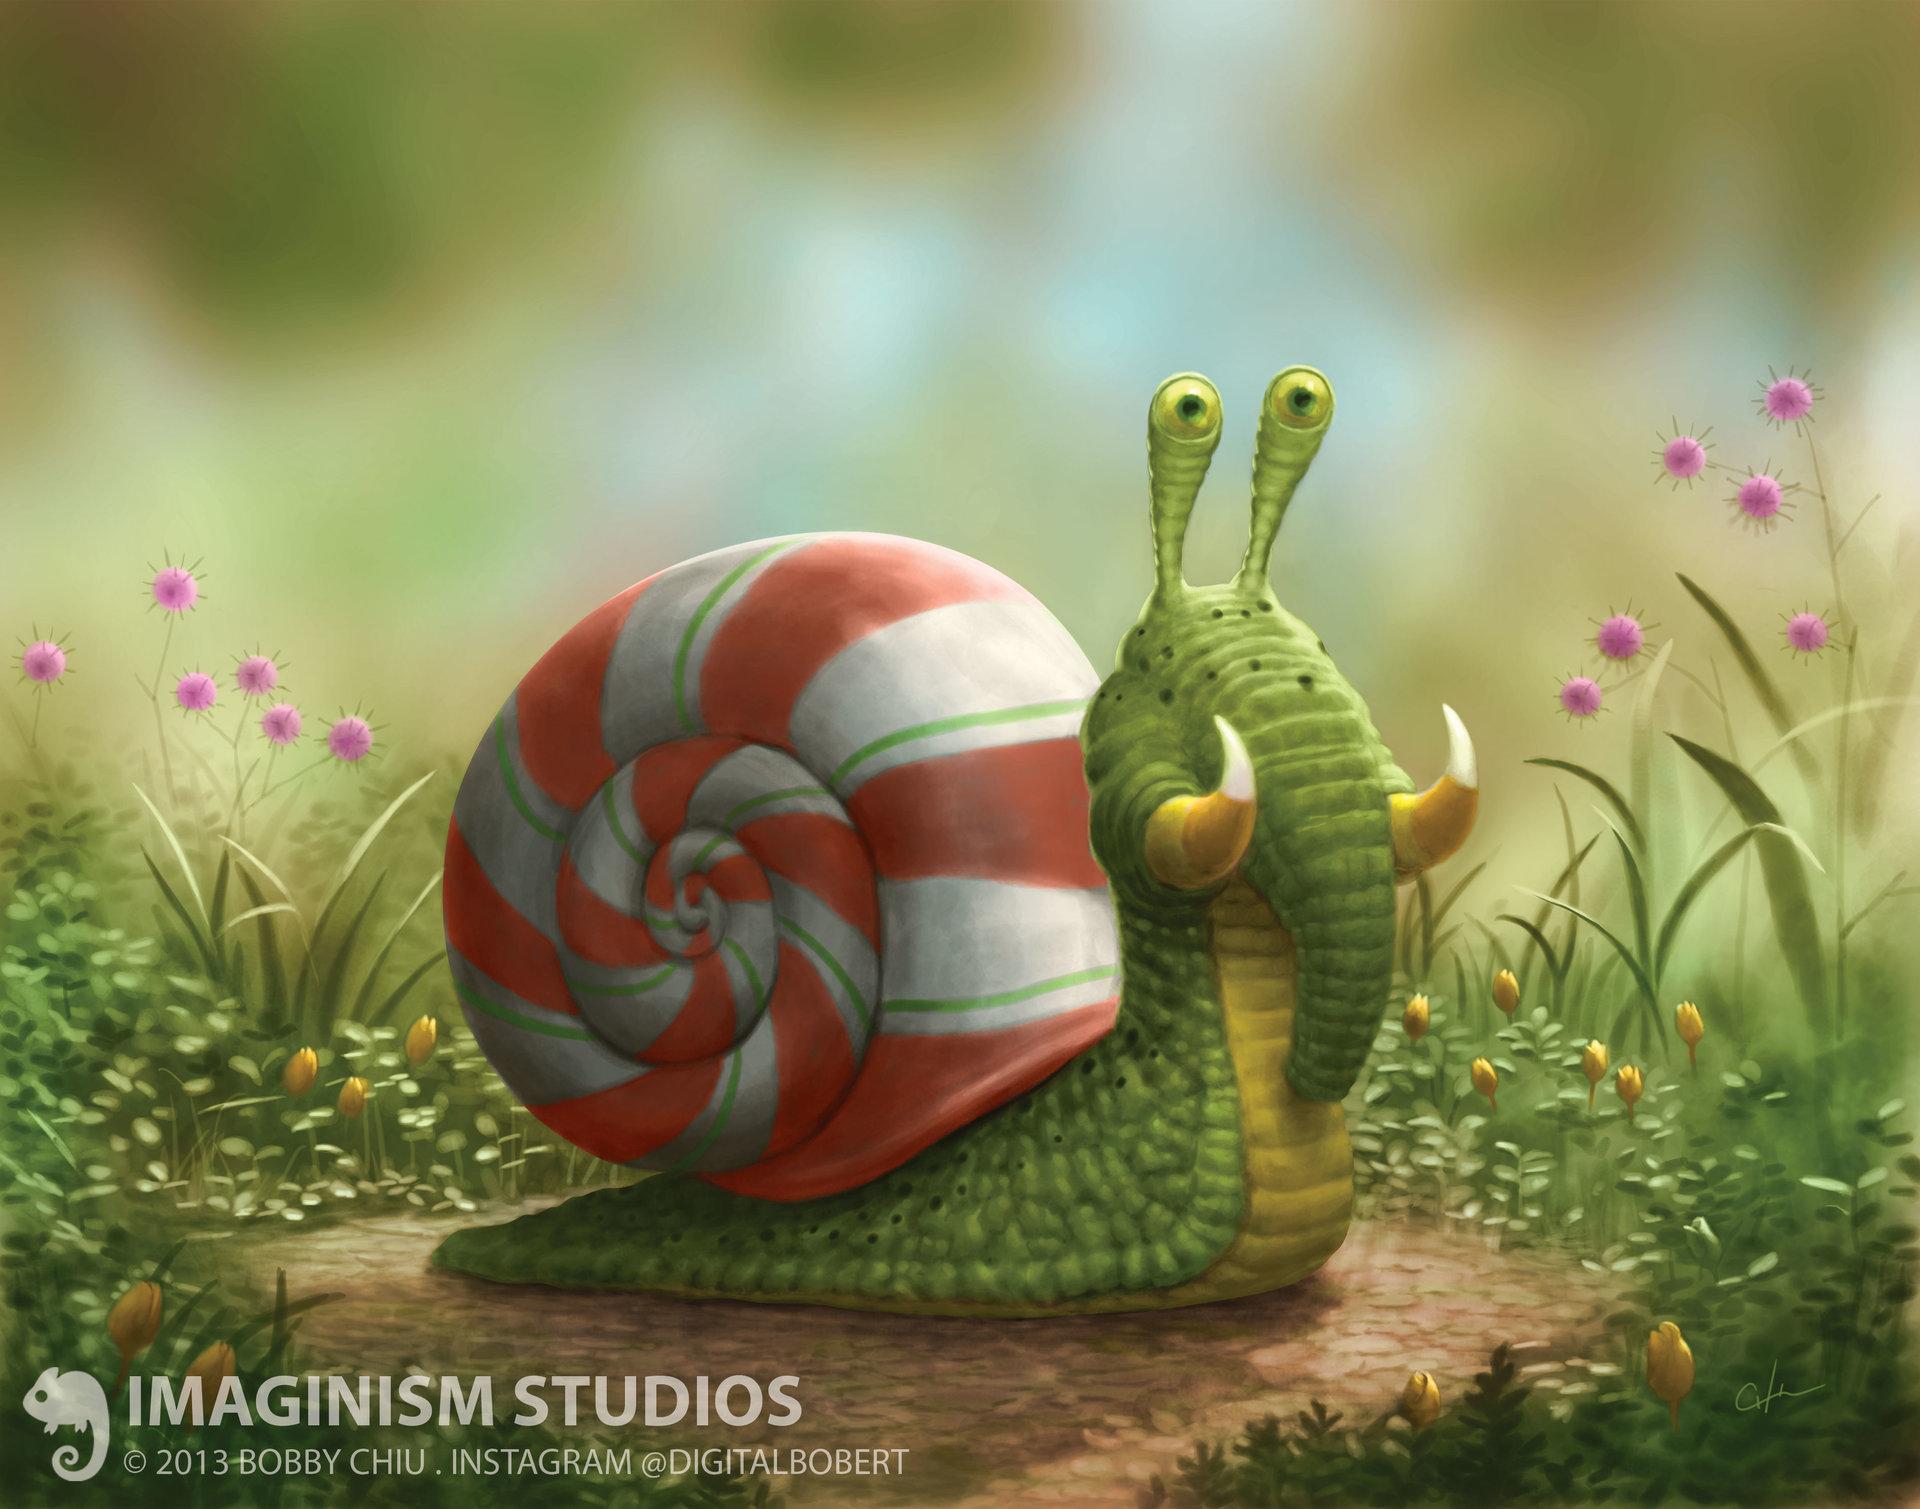 bobby_chiu_fablehatch_digital_artist_illustration_0024.jpg